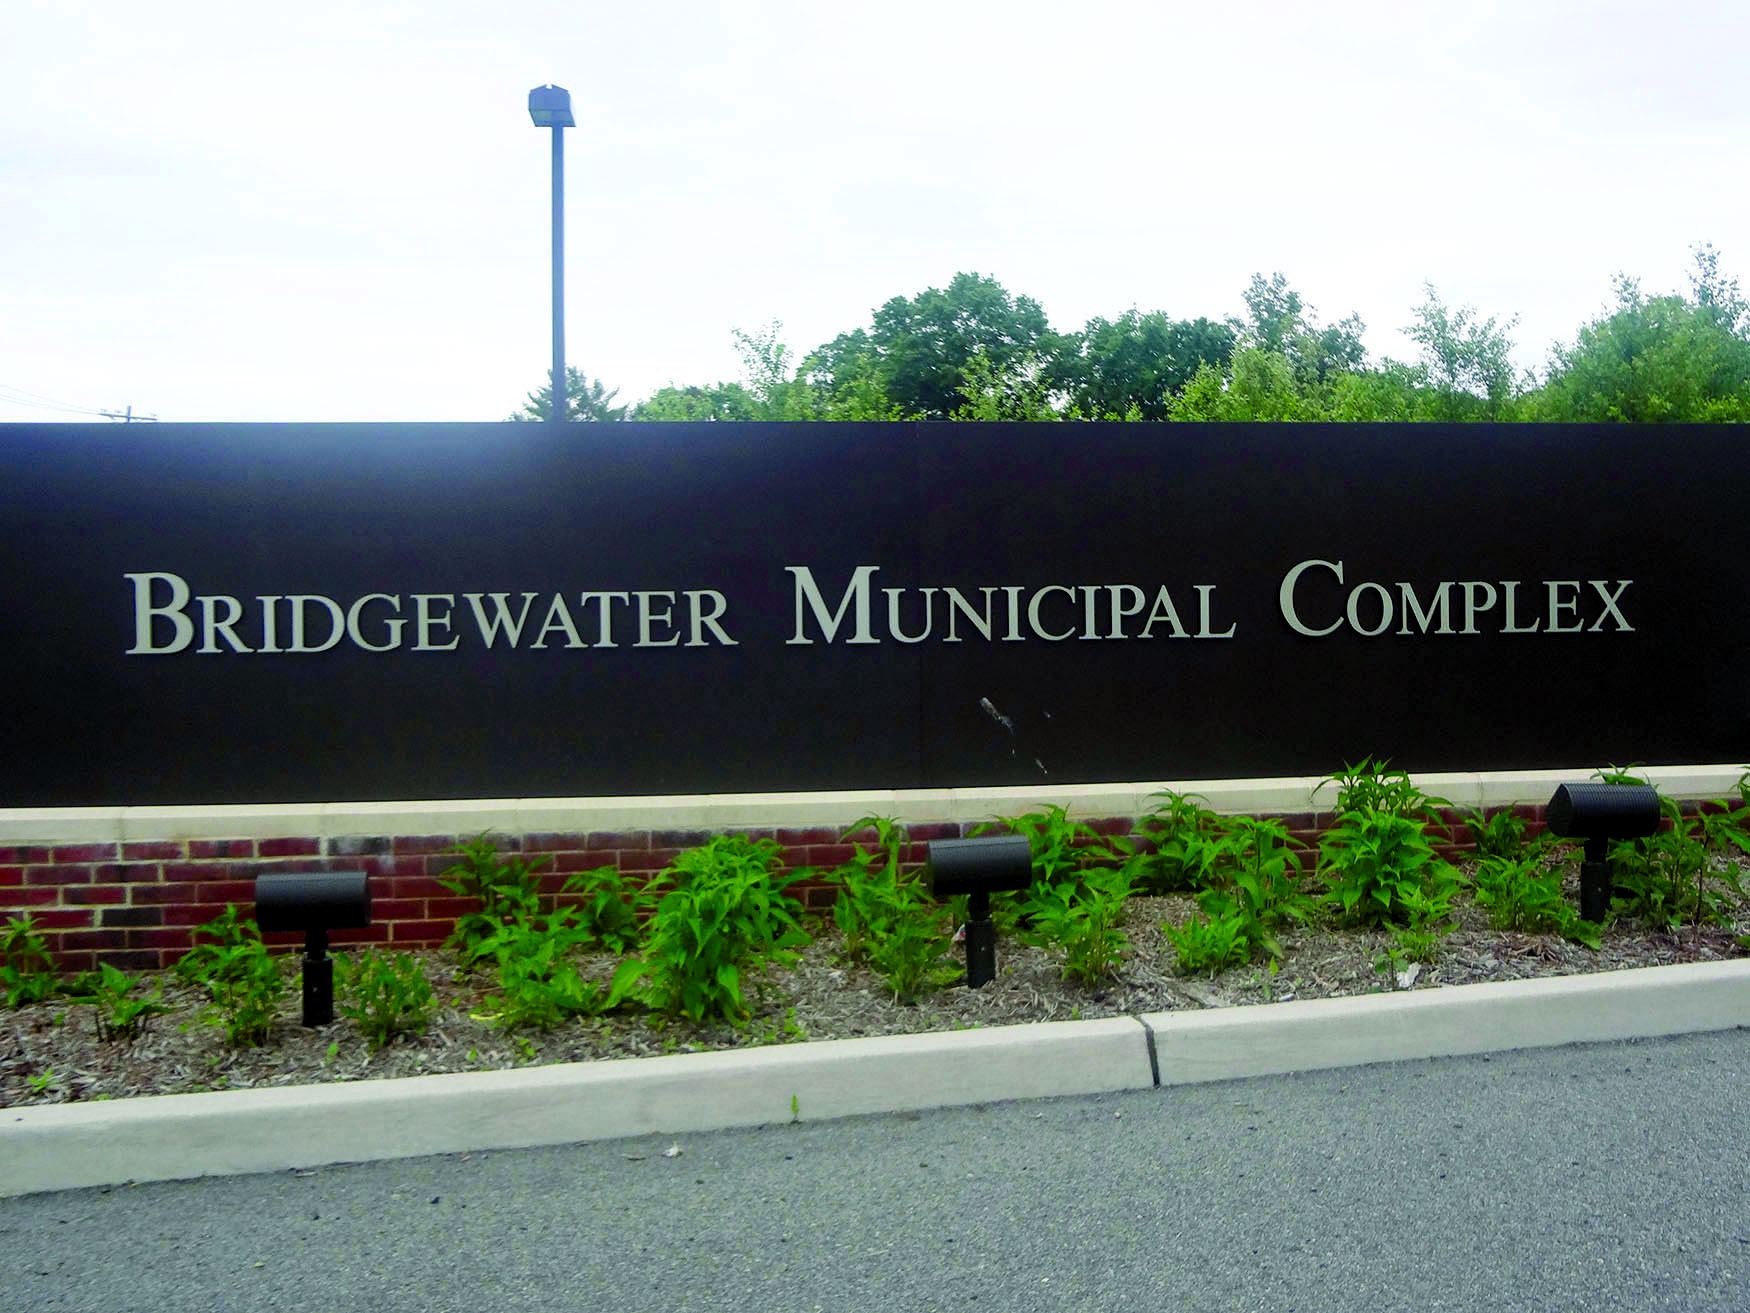 bb61e9ec7645b0544d8e_Bridgewater_municipal.jpg